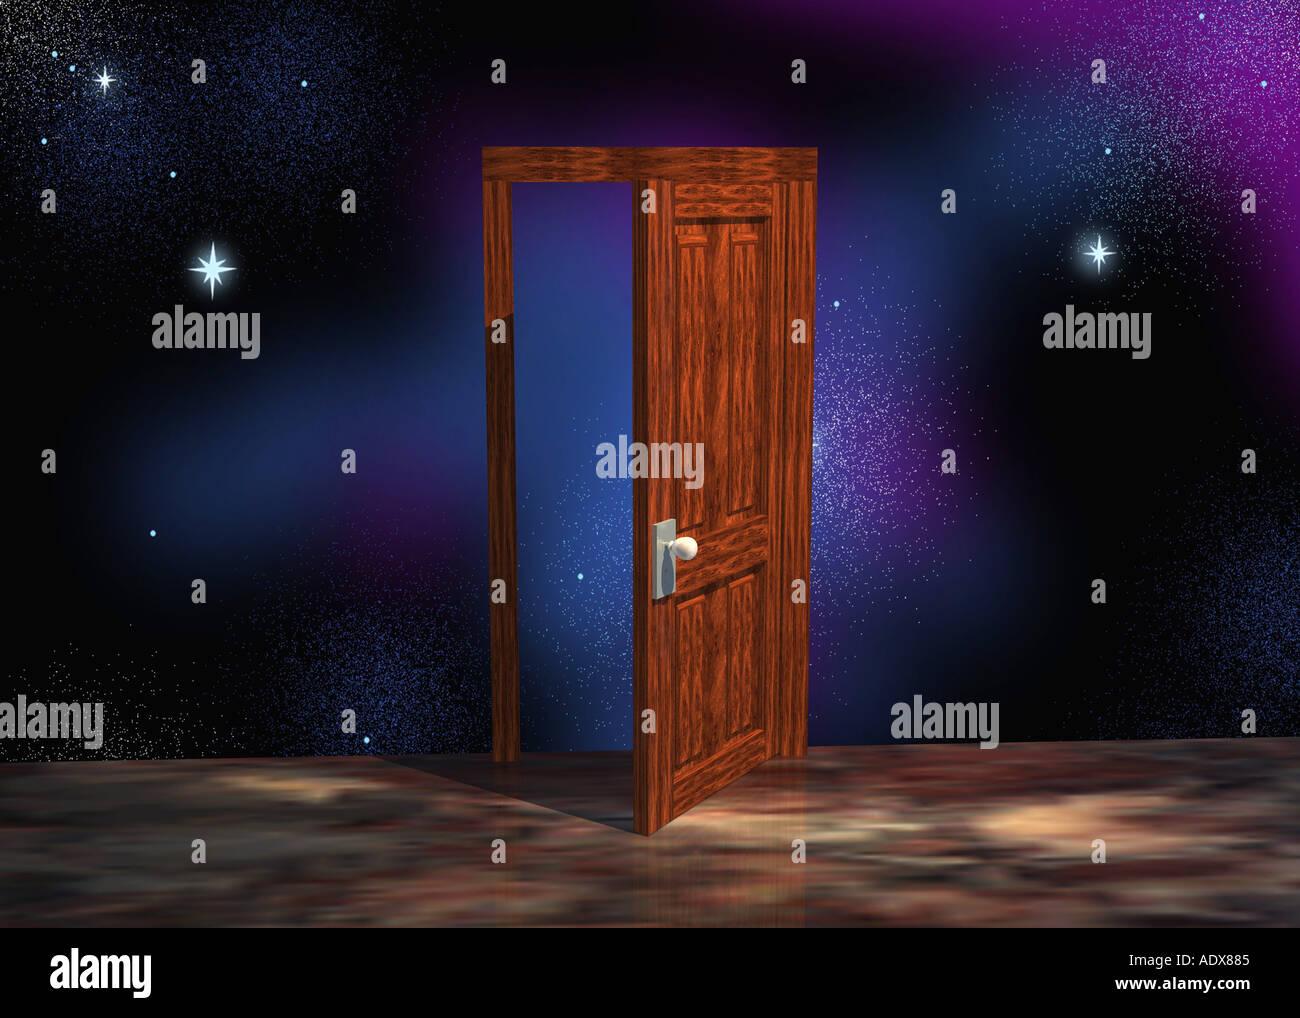 Illustrationen Tür Türrahmen Türpfosten Tür Rahmen Rahmung Raum ...